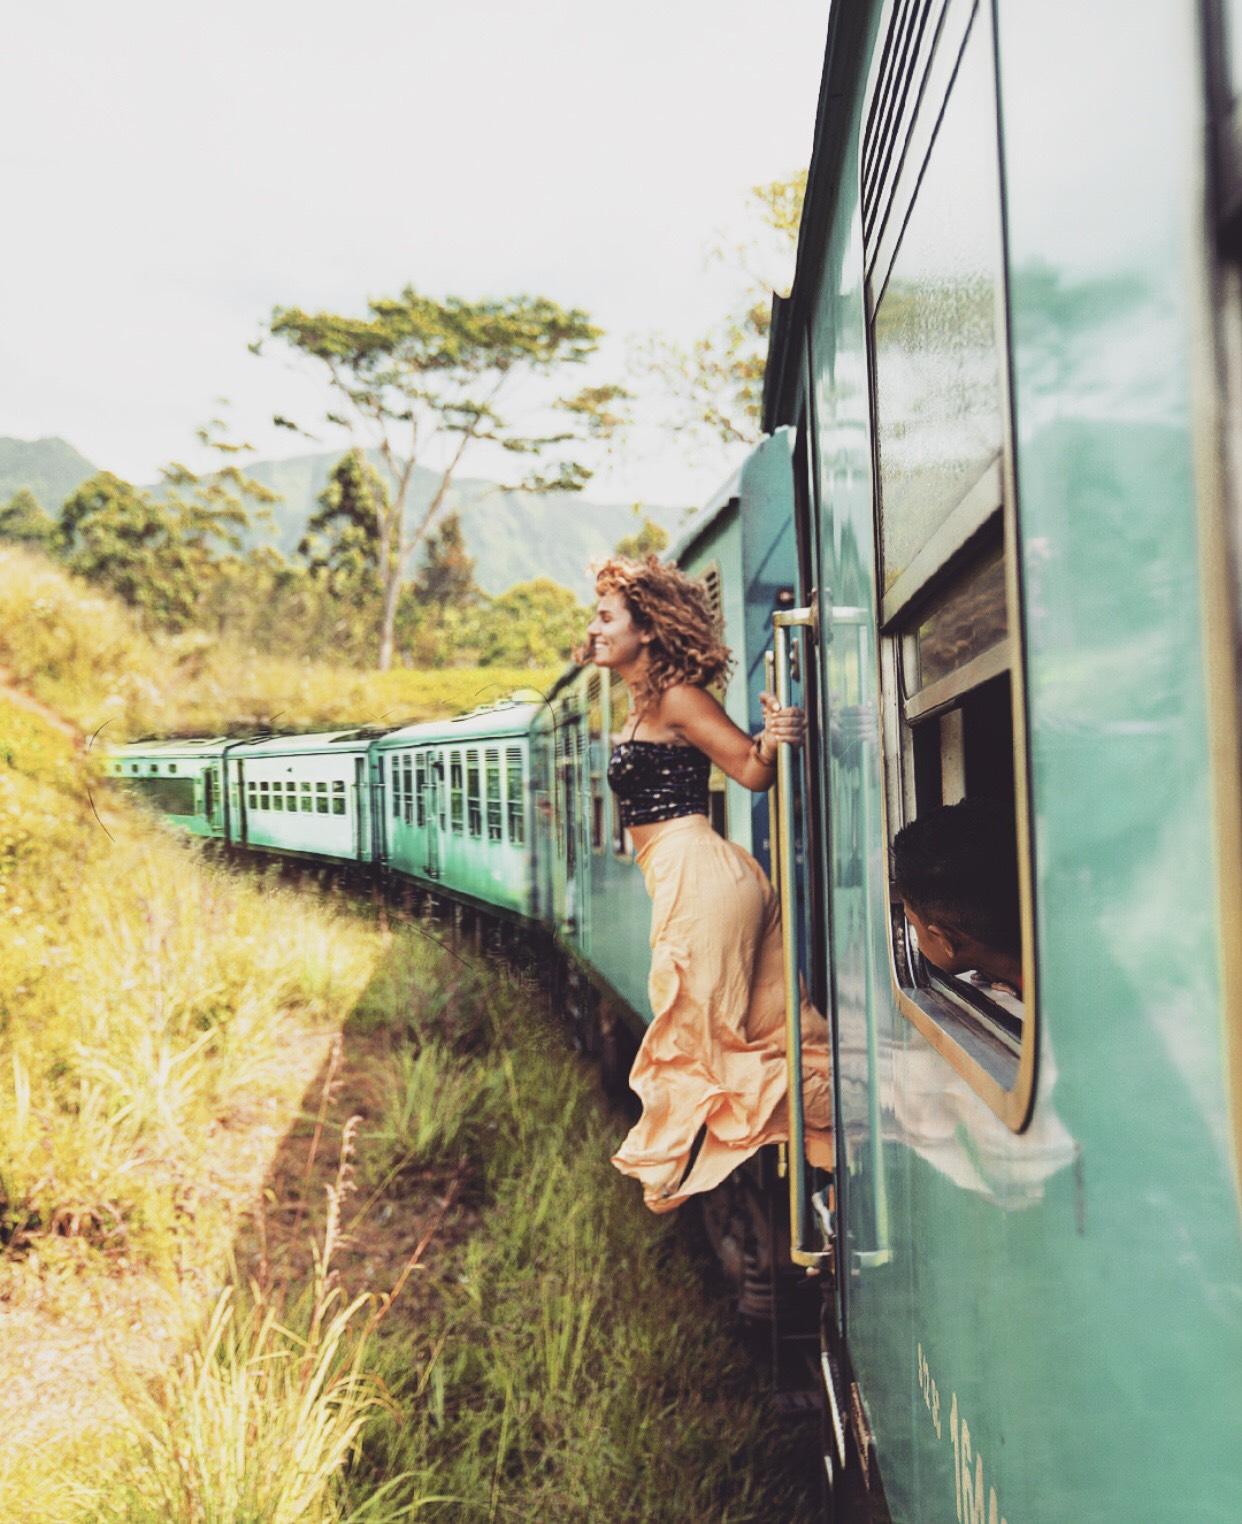 Emily-Carrello-train.jpeg